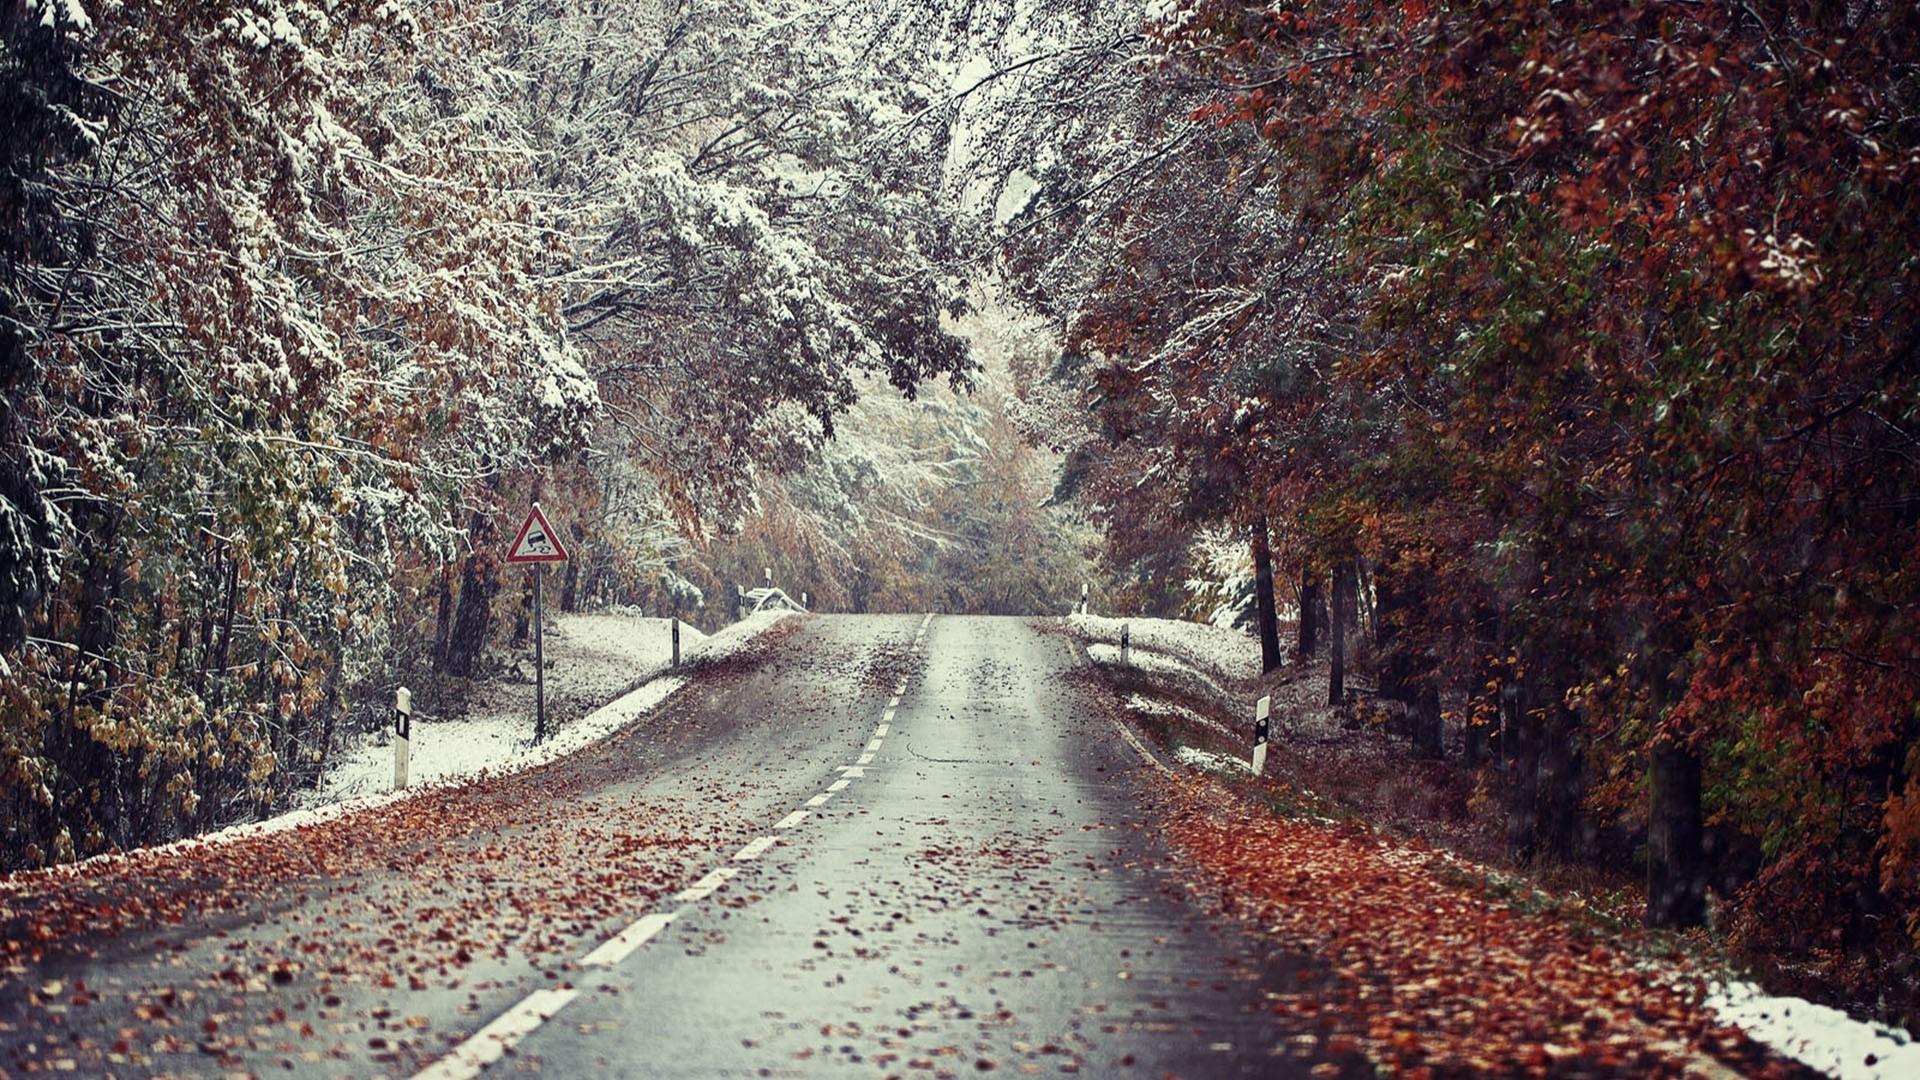 Fall Landscape Computer Wallpaper Winter Landscape Road Snow Leaves Wallpapers Hd